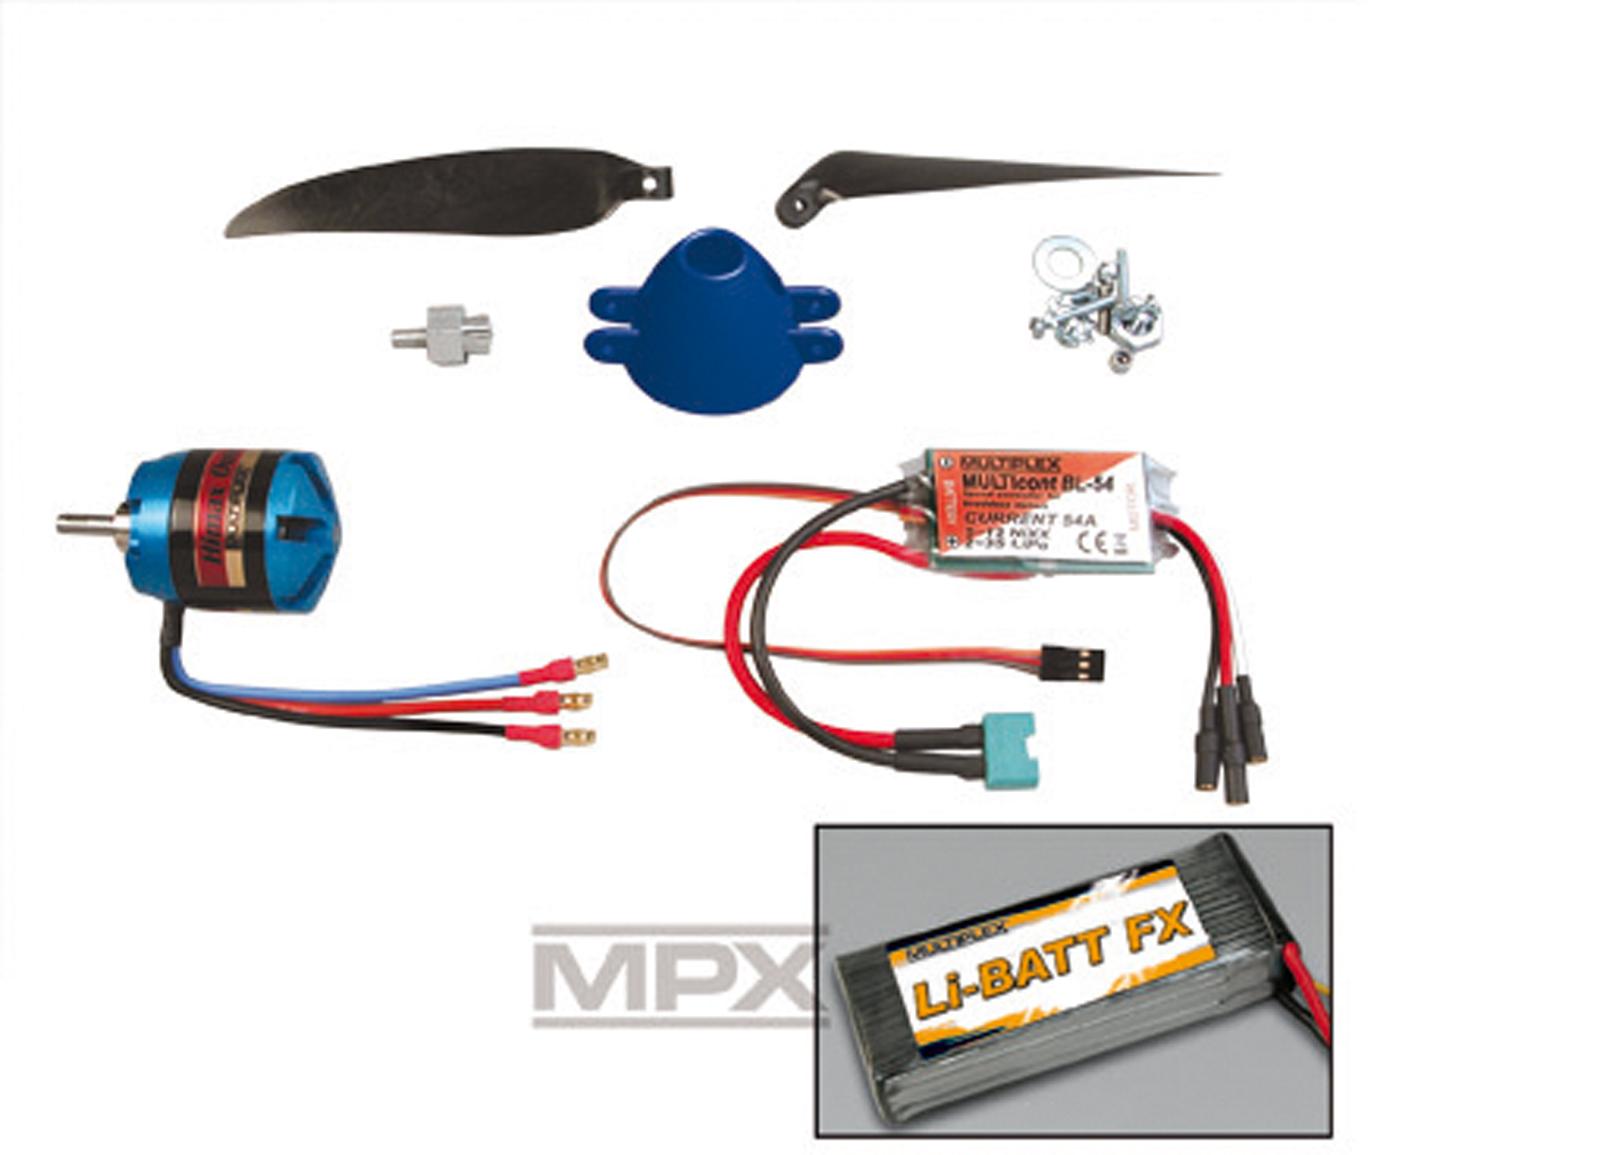 Antriebssatz Blizzard Tuning Li-BATT powered